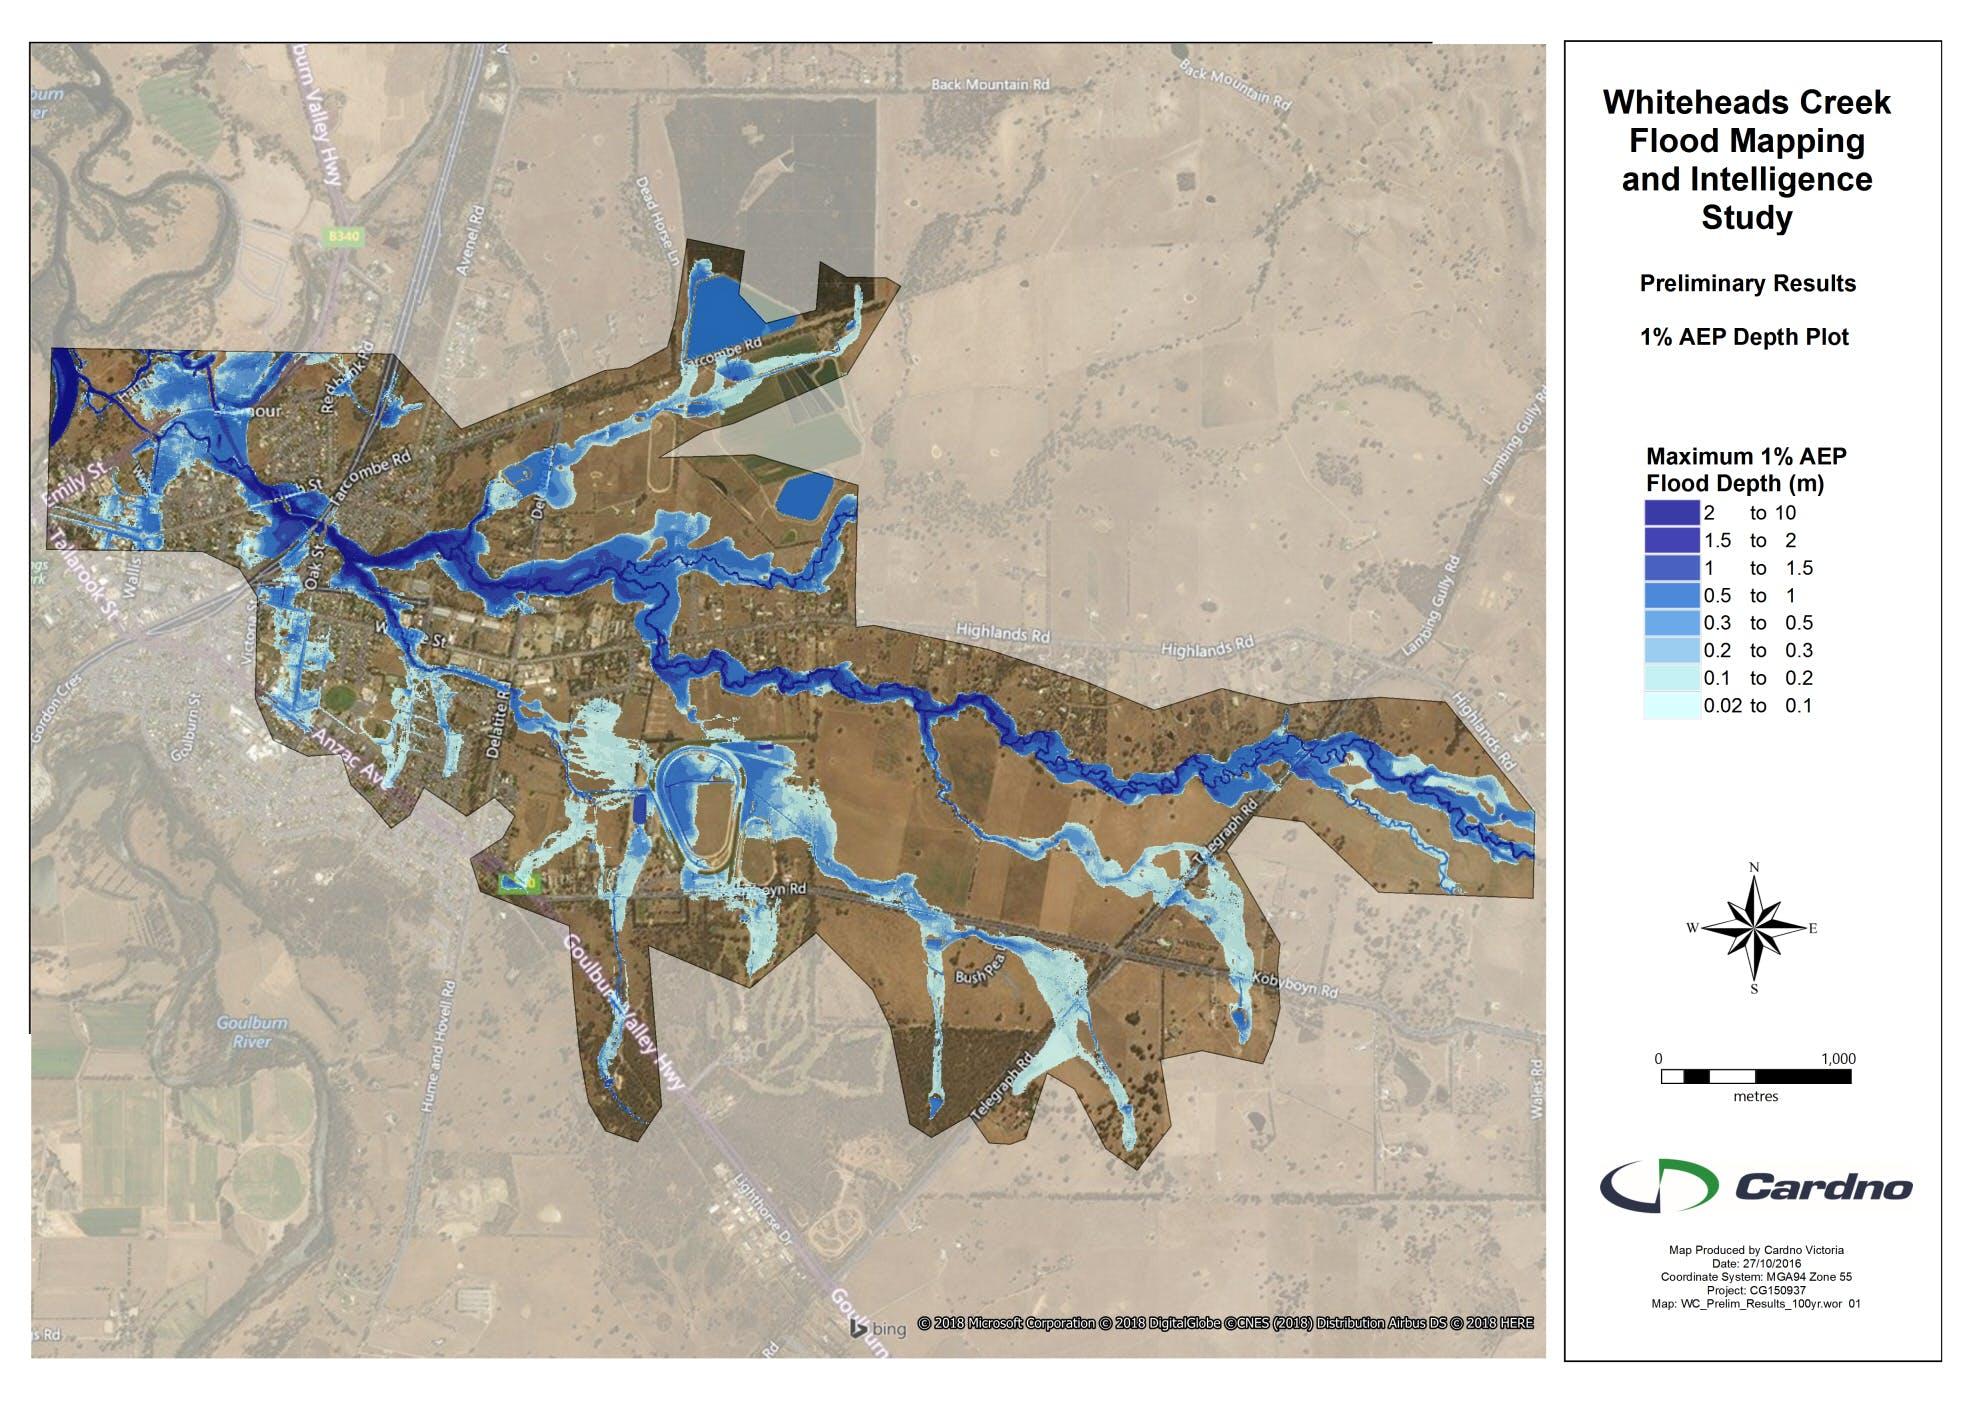 Lower Whiteheads Creek flood study area